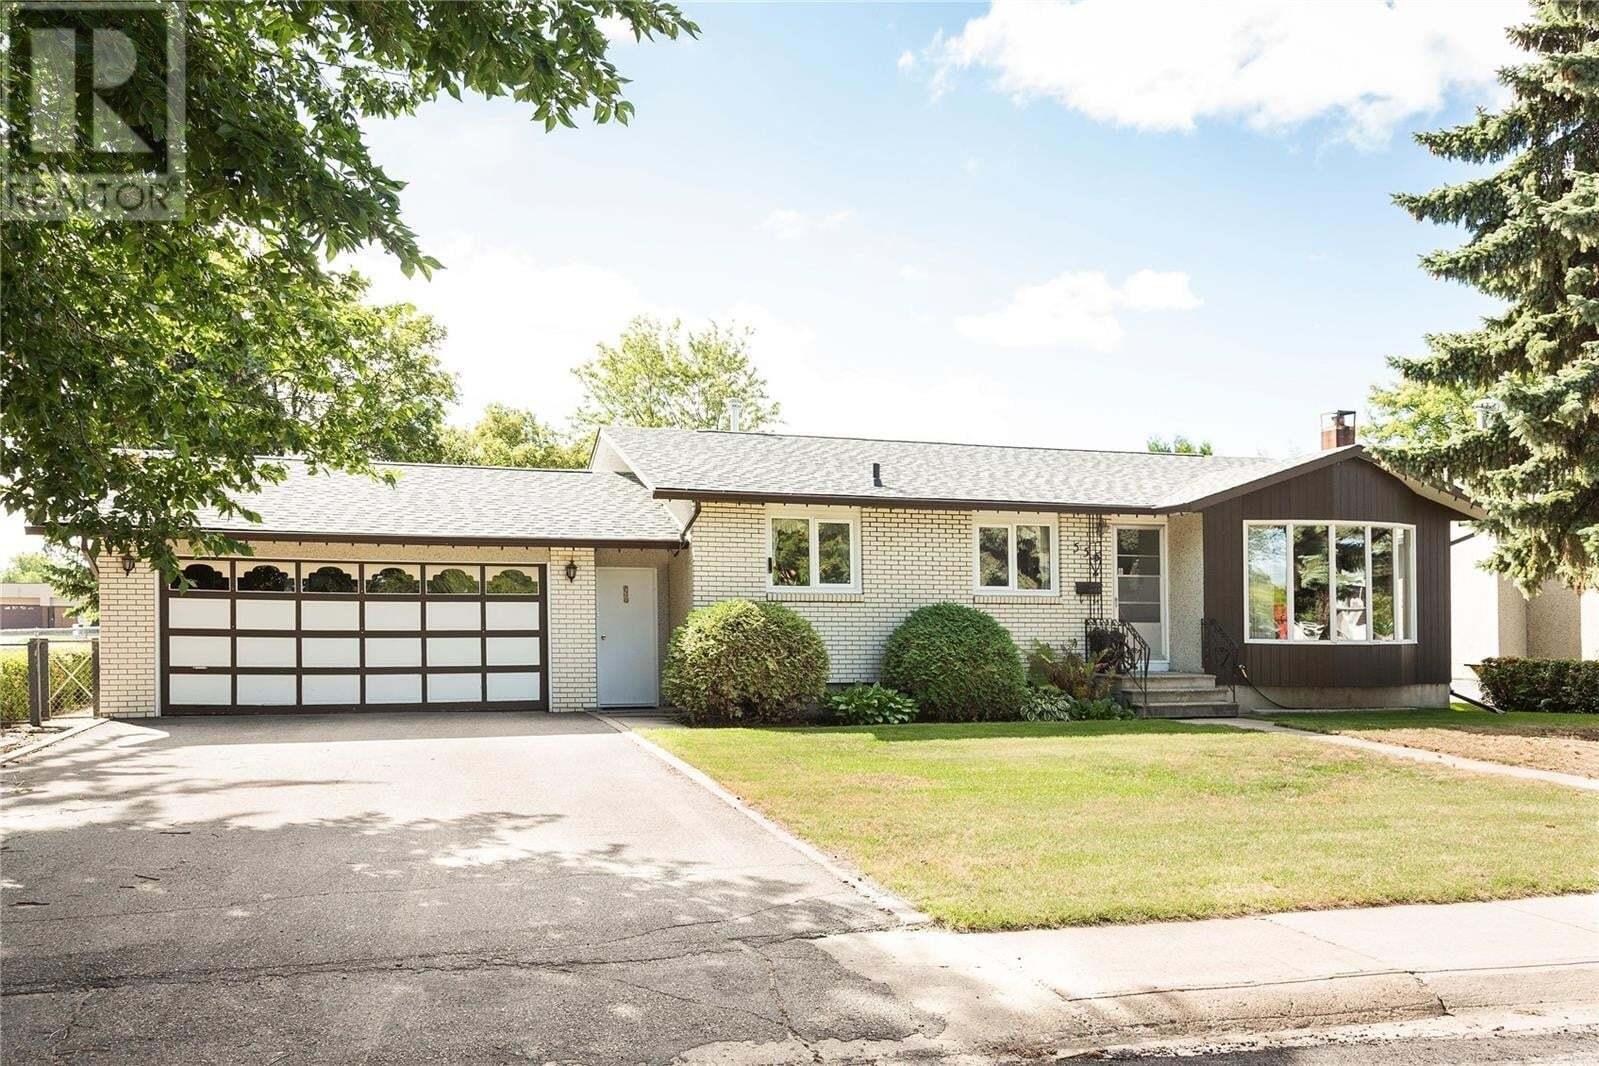 House for sale at 555 27th St W Prince Albert Saskatchewan - MLS: SK826120